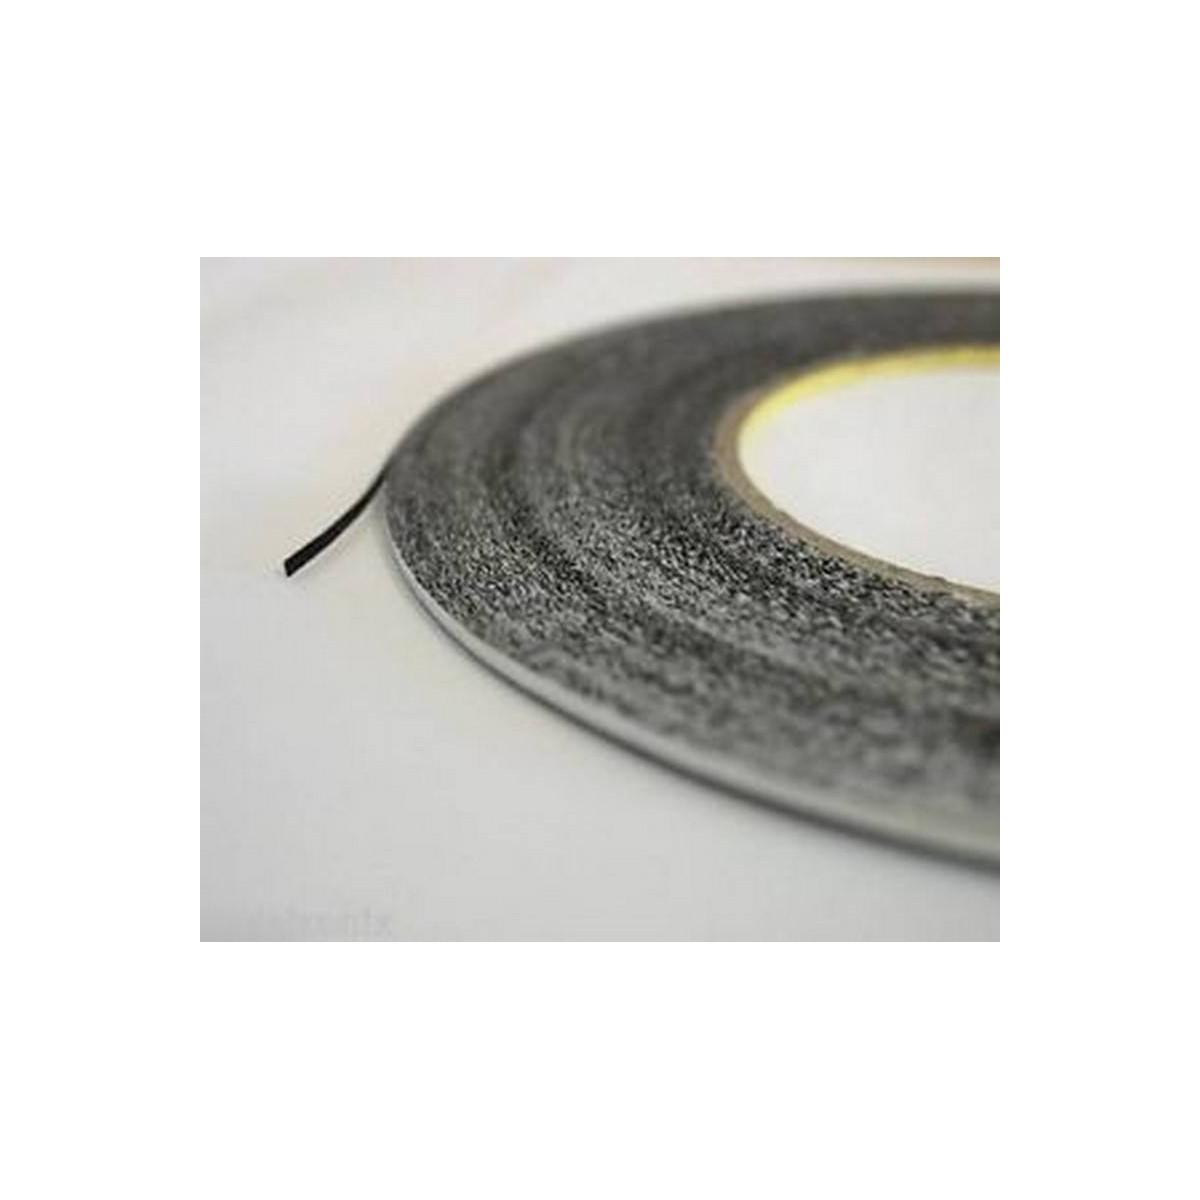 Cinta adhesiva de doble cara 3M, 5mm